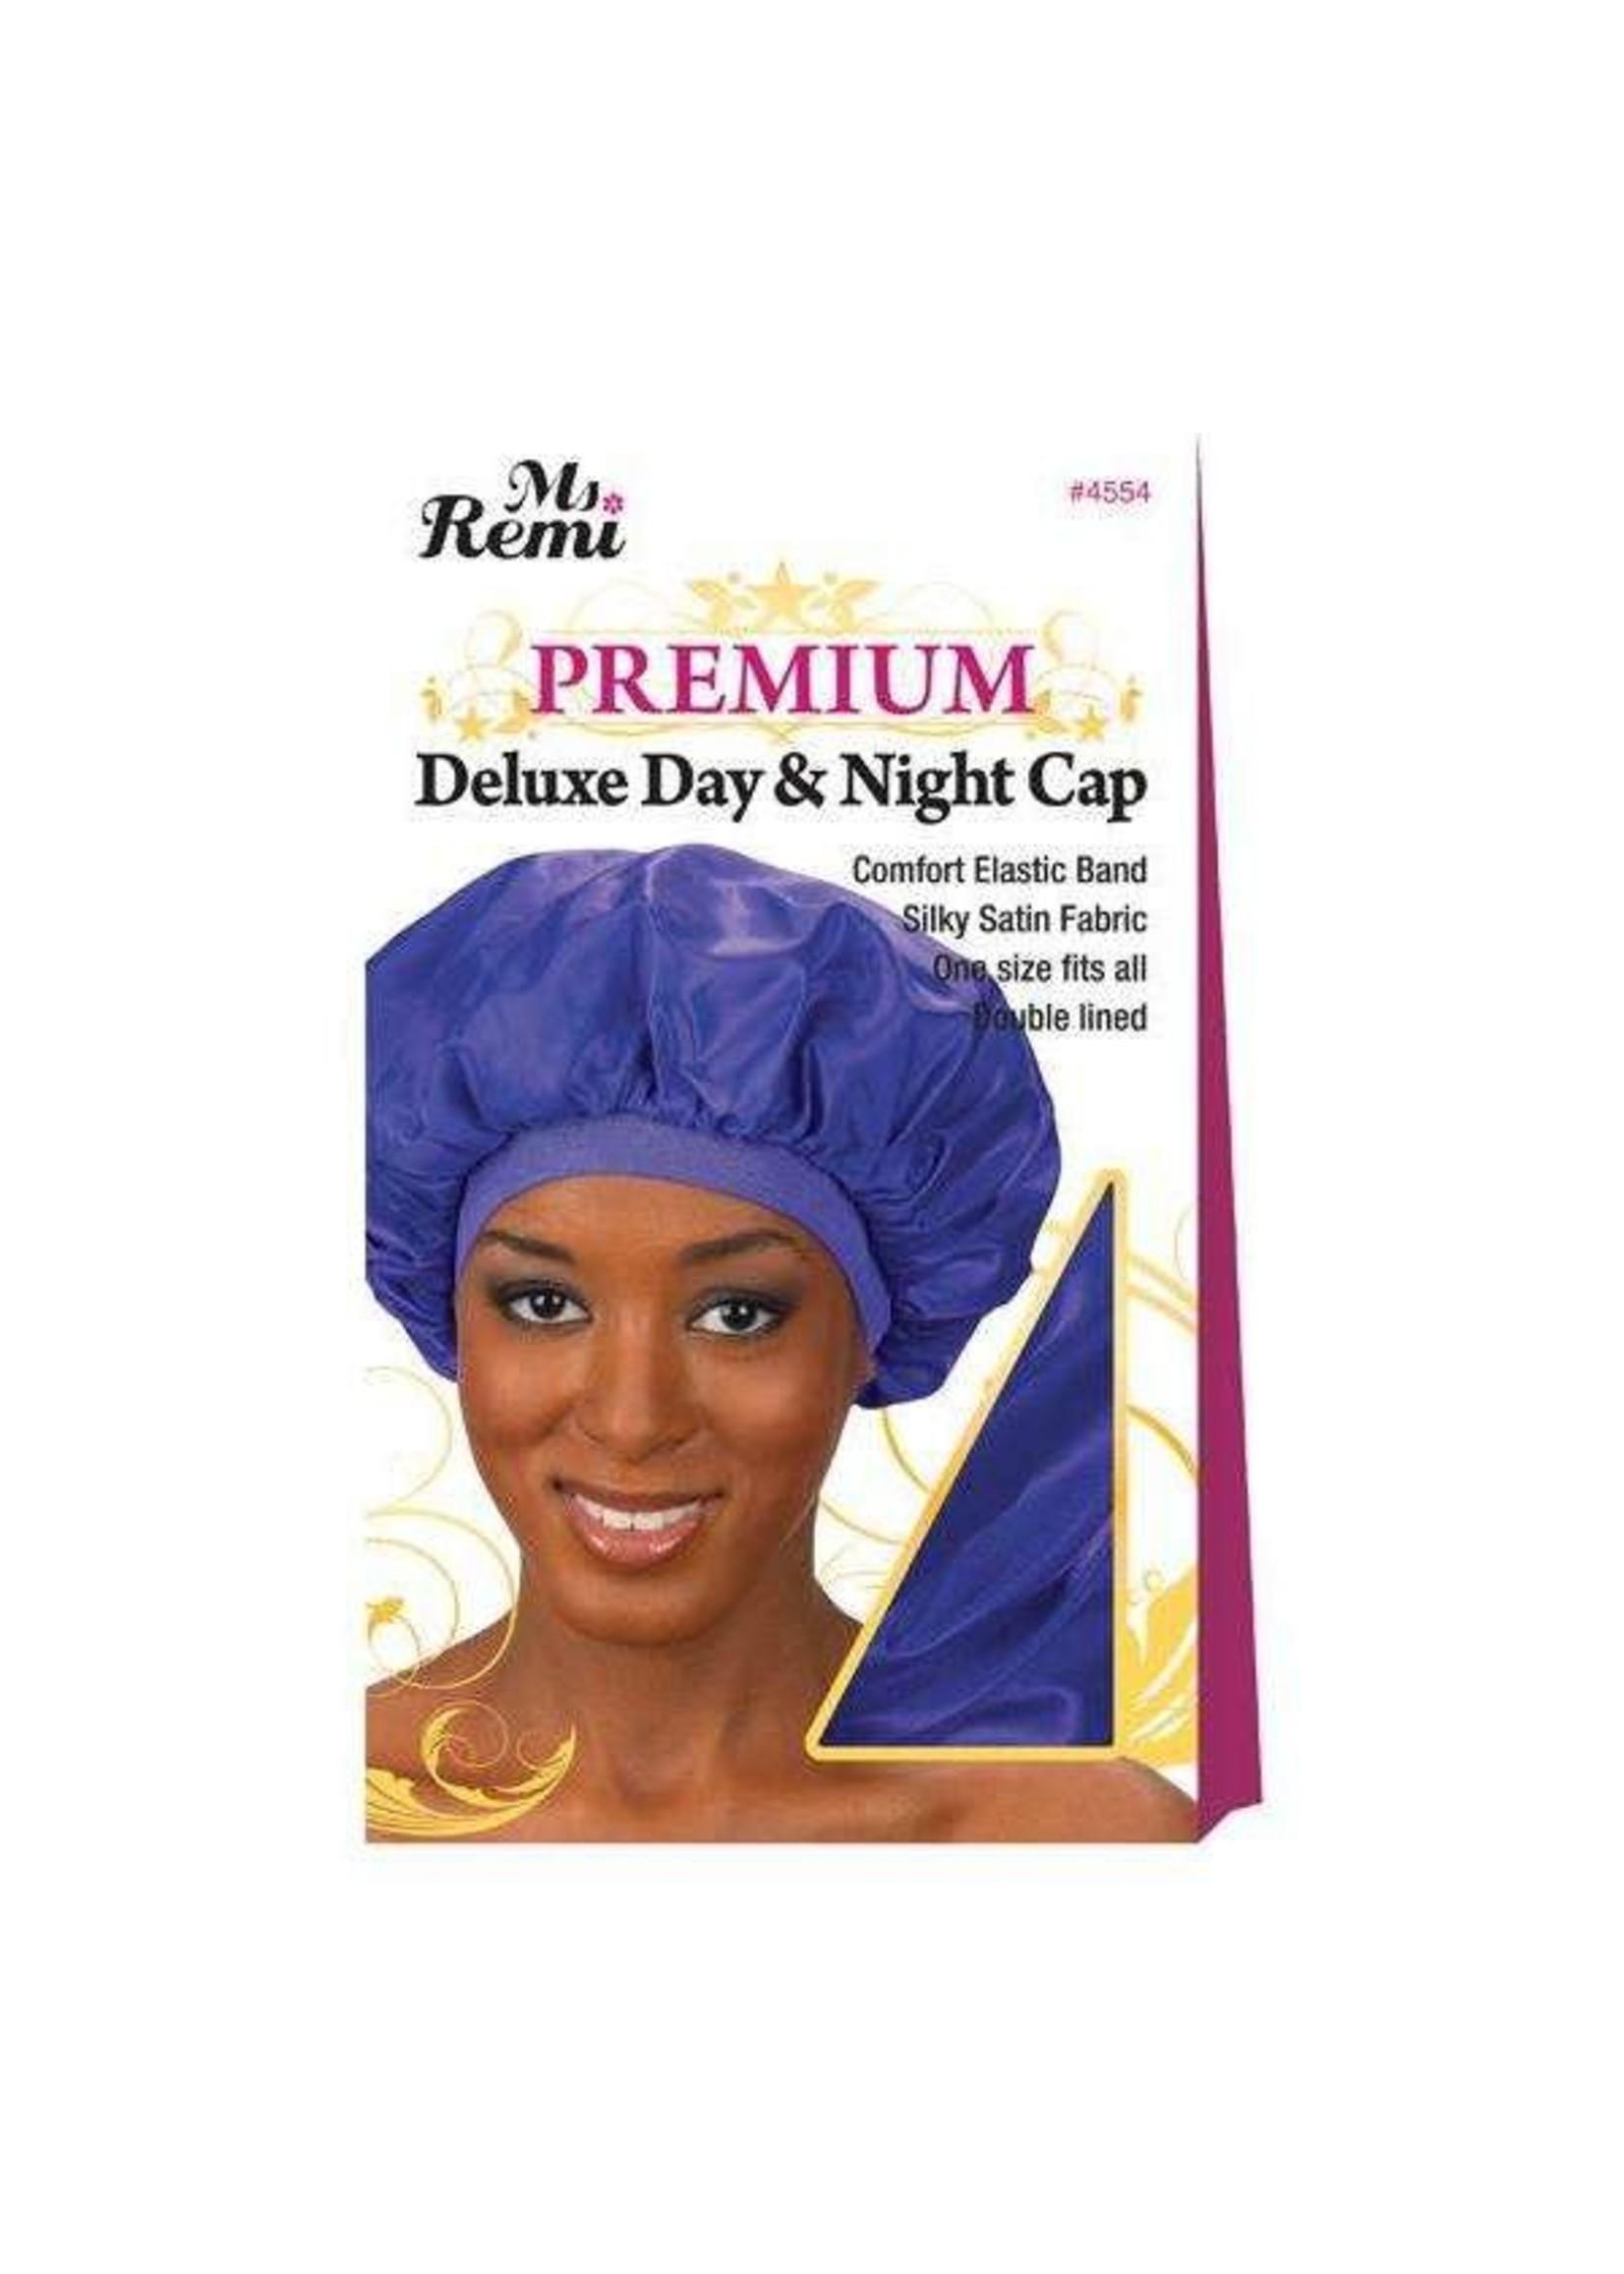 Annie Ms. Remi Premium Deluxe Day & Night Cap